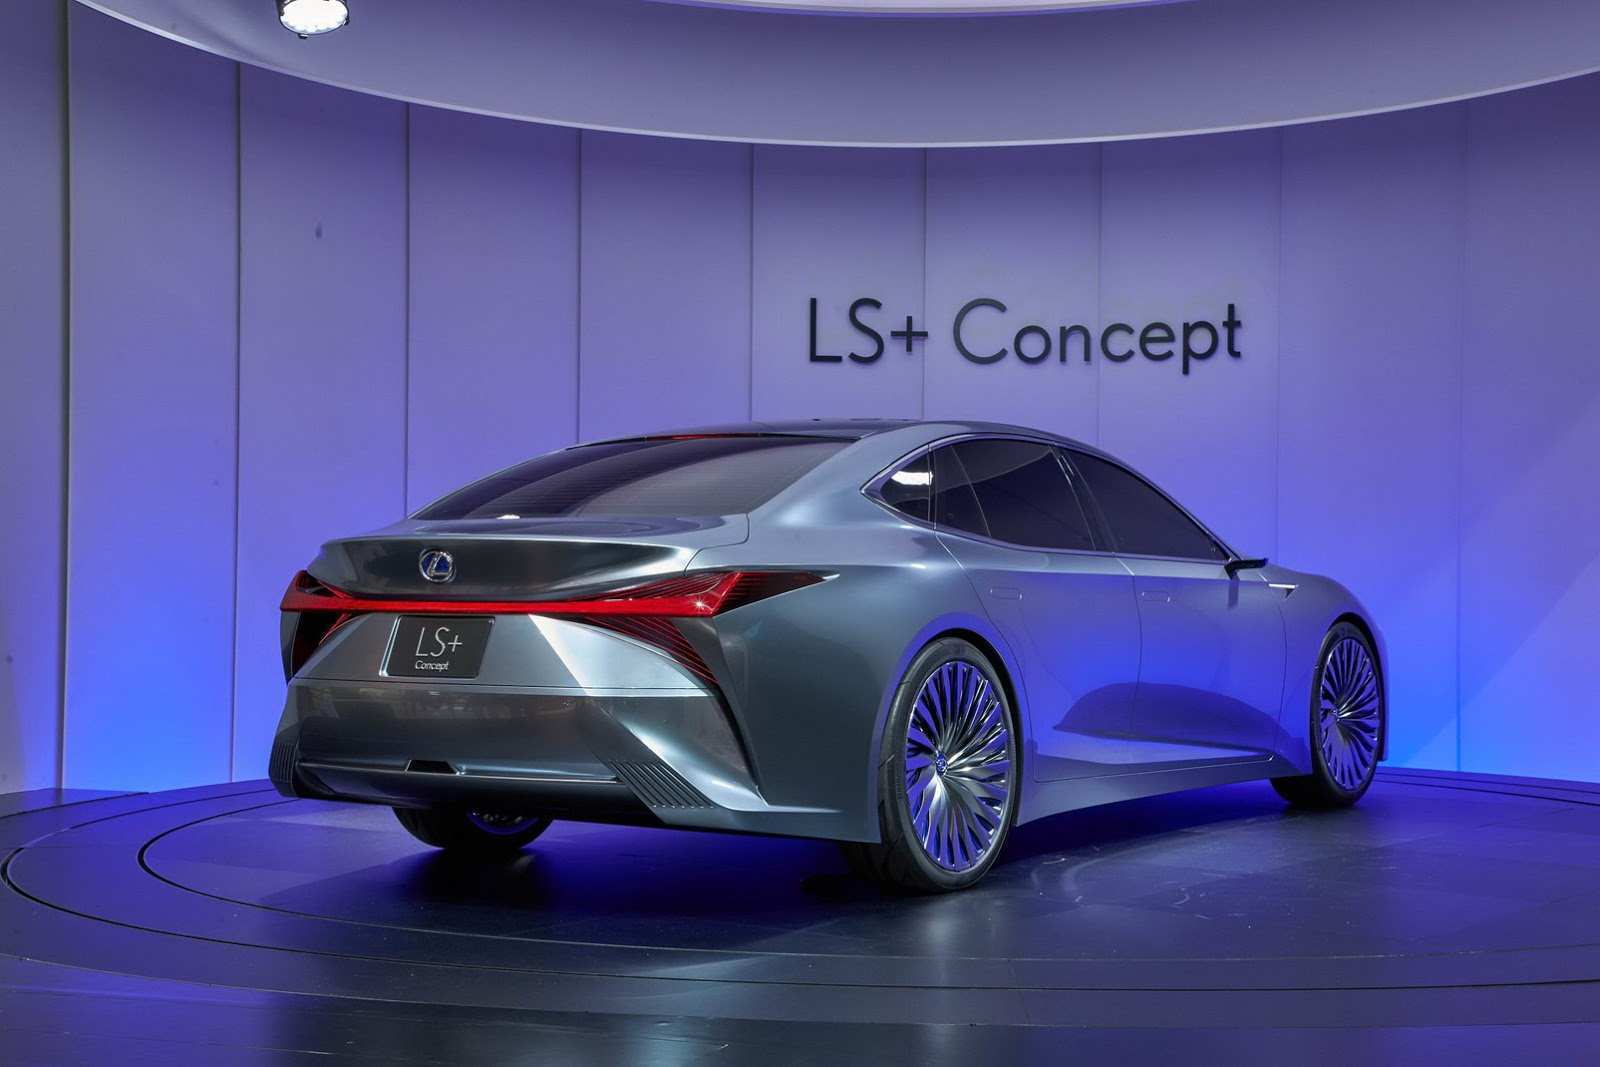 59 All New Ls Lexus 2020 Exterior and Interior with Ls Lexus 2020